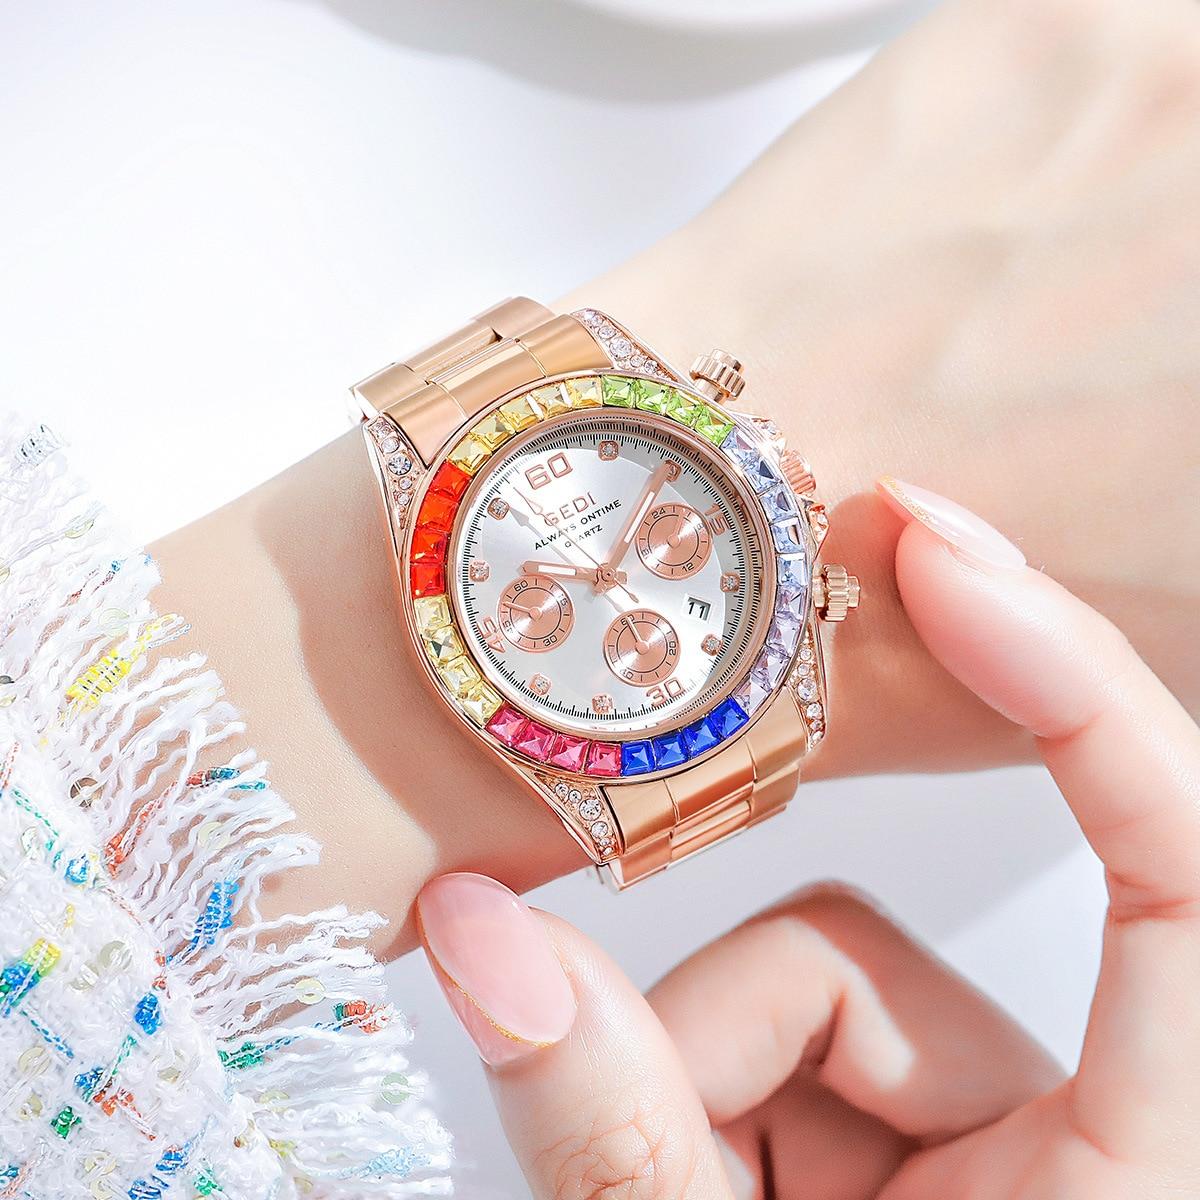 Luxury Man Watch Big Dial Women Waterproof Rose Gold Steel Strap Women WristWatches Top Brand Bracelet Clocks Relogio Feminino enlarge